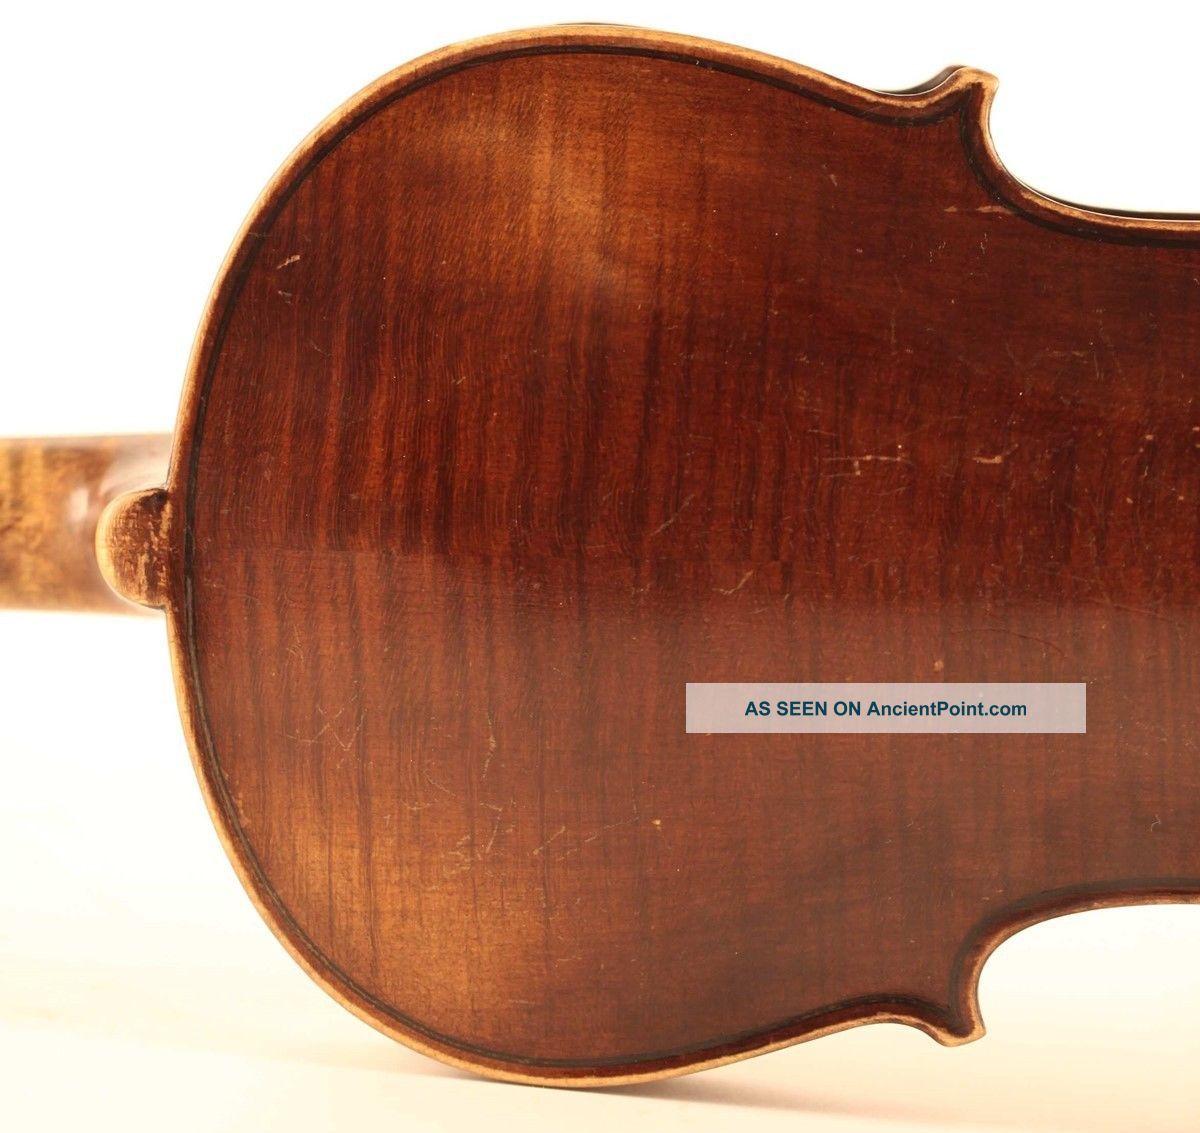 Italian Master Old Violin T.  Eberle 1774 Geige Violon Violino Violine 小提琴 バイオリン String photo